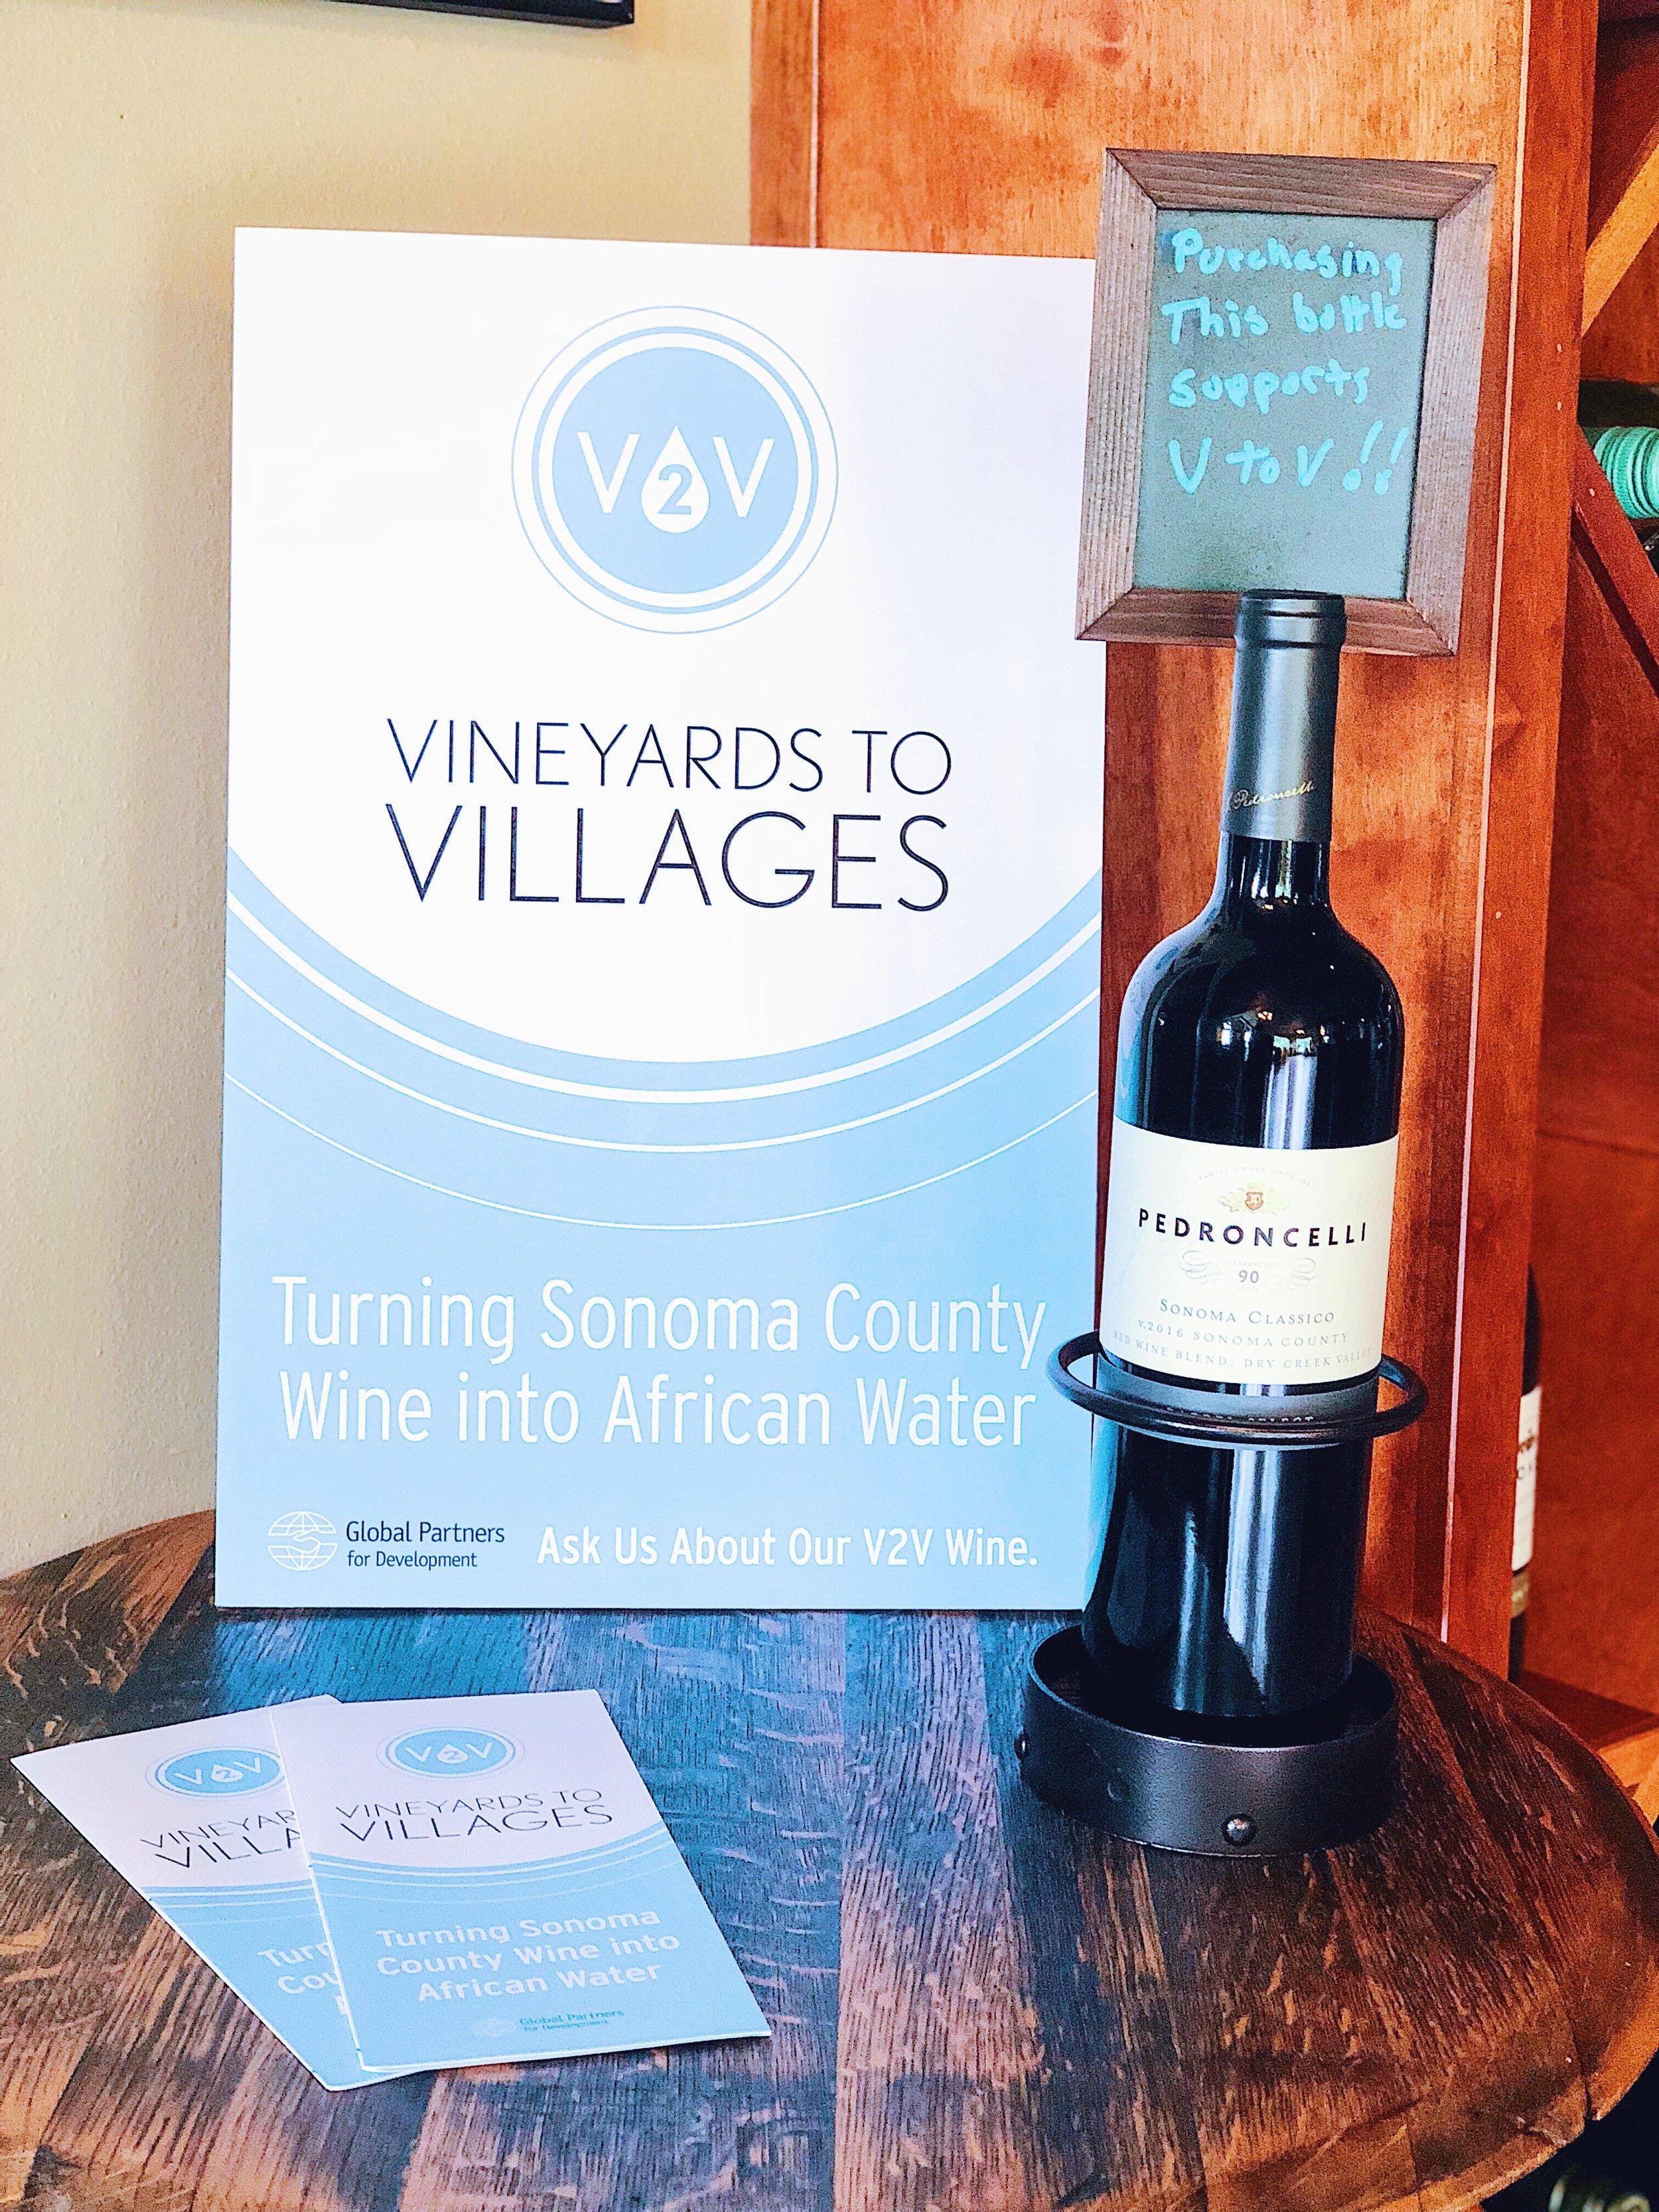 Vineyards To Villages